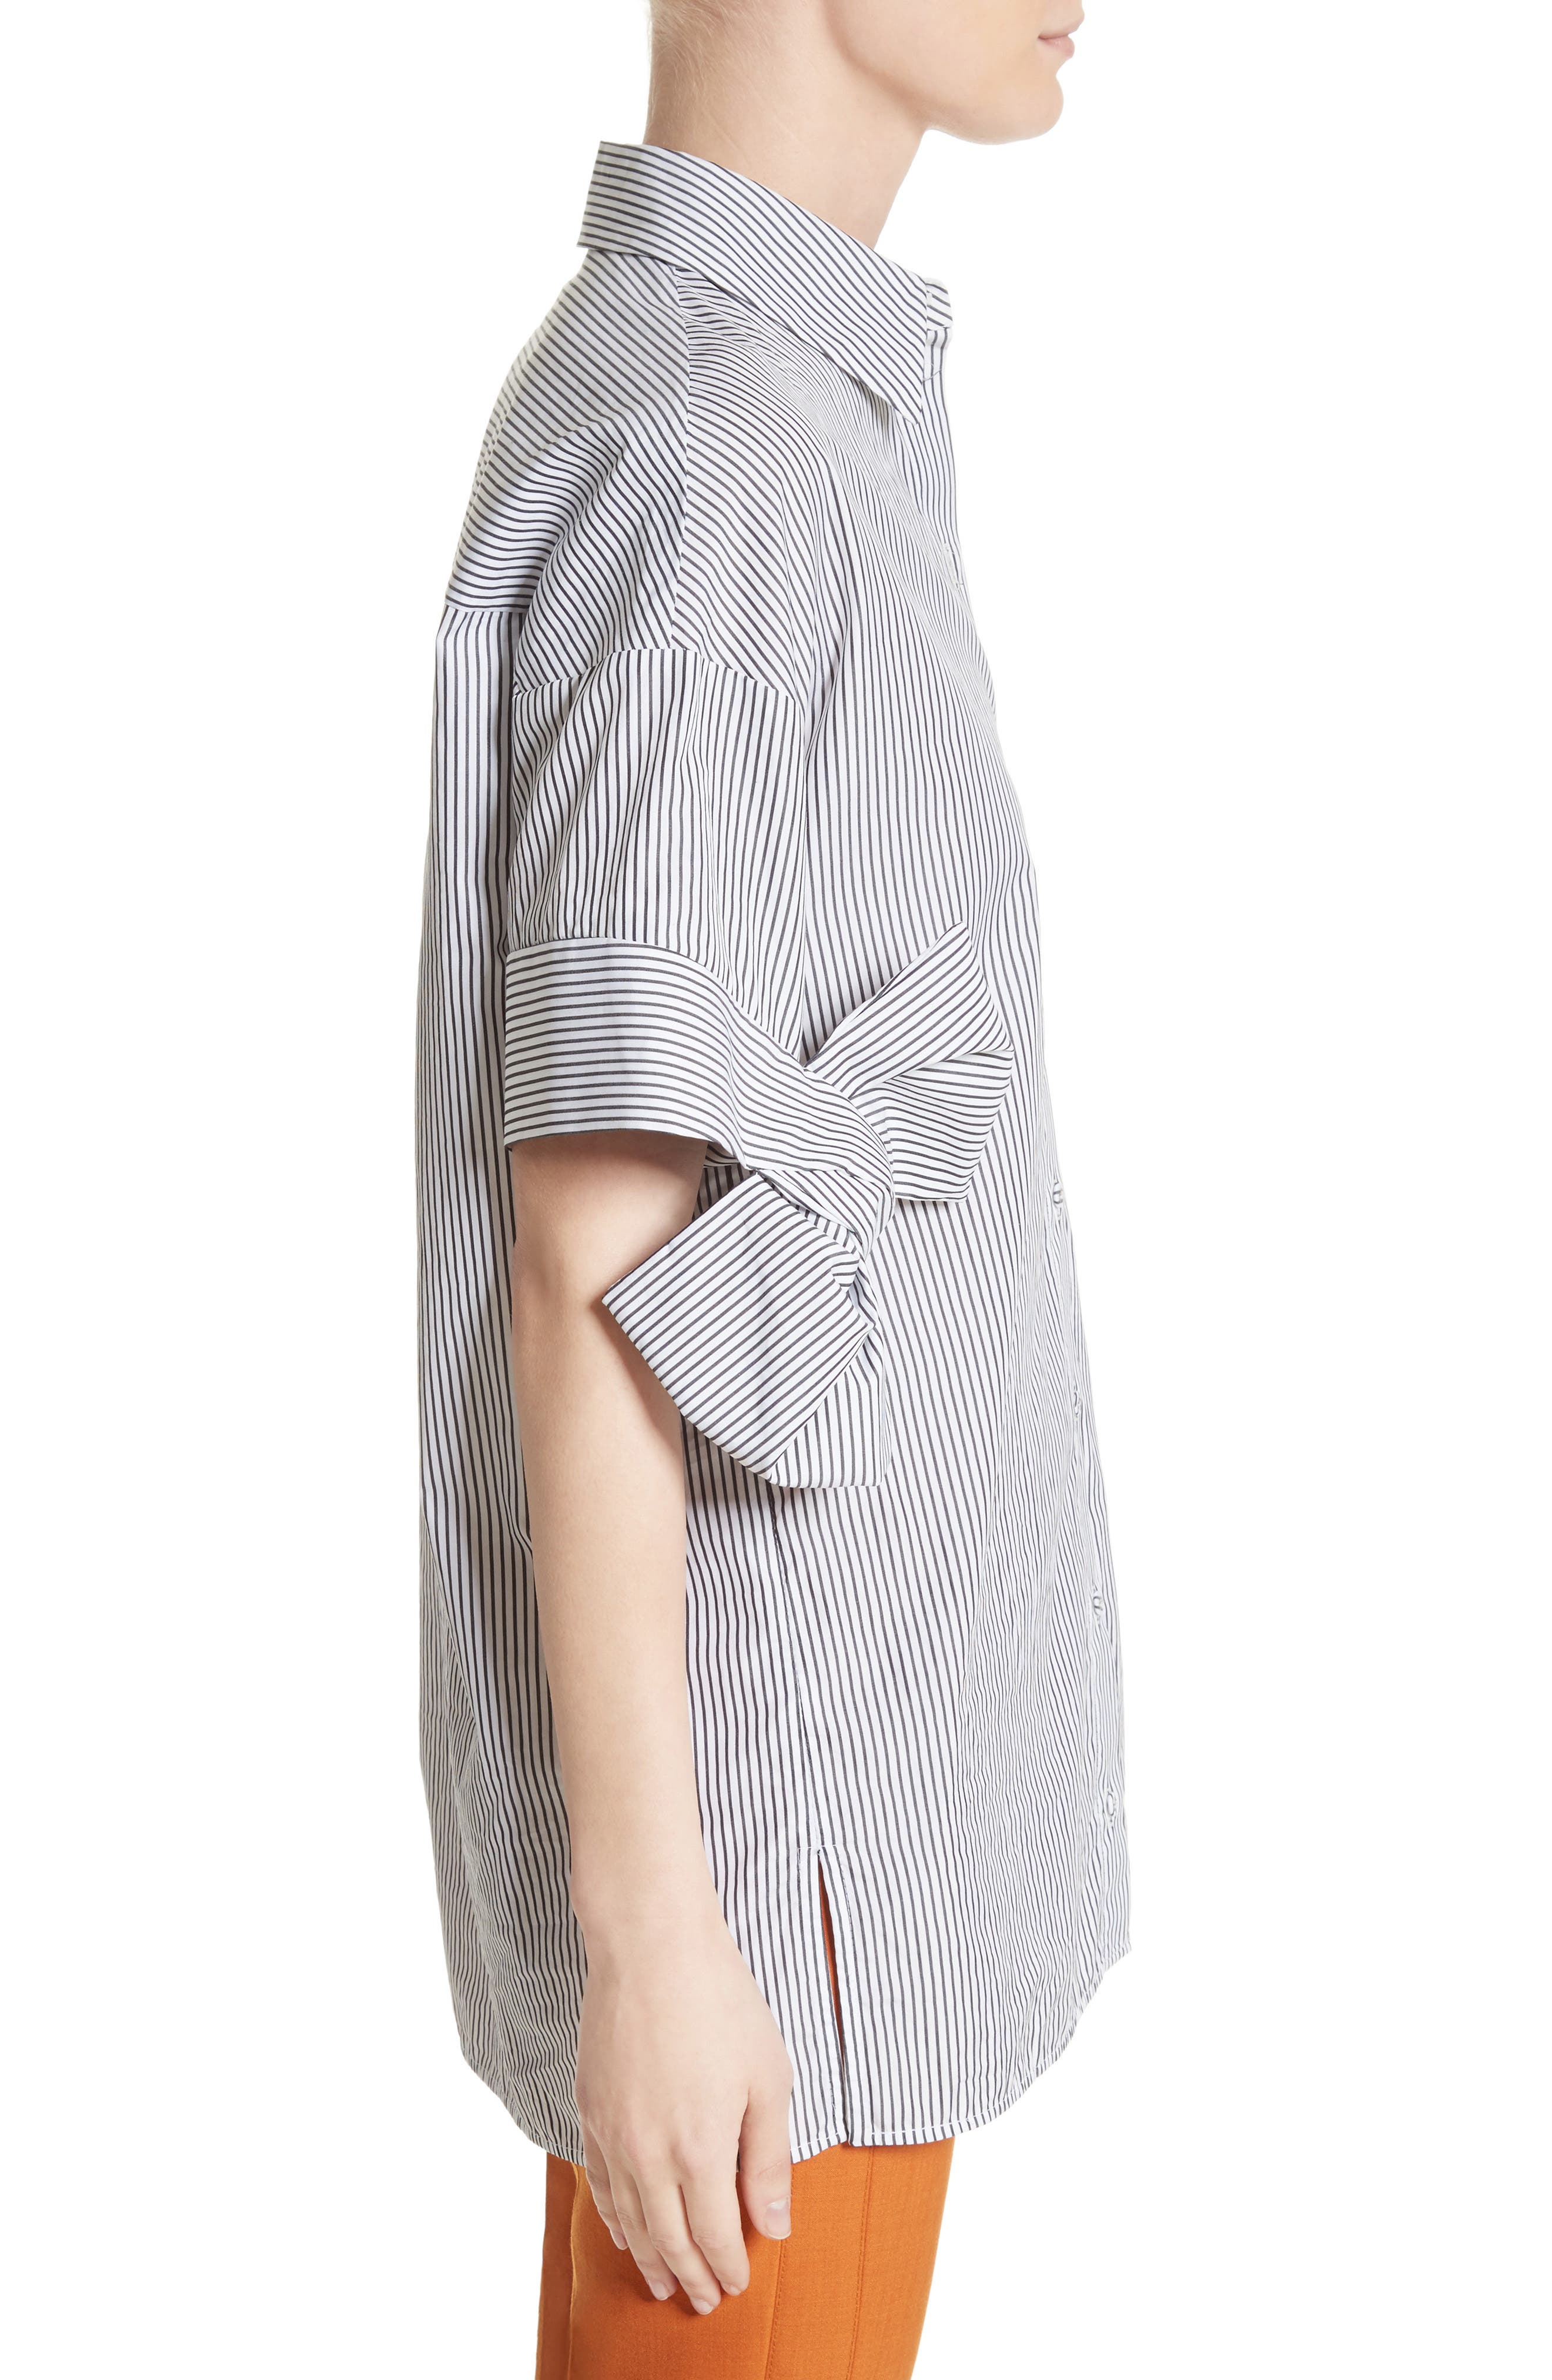 Bow Sleeve Shirt,                             Alternate thumbnail 3, color,                             001